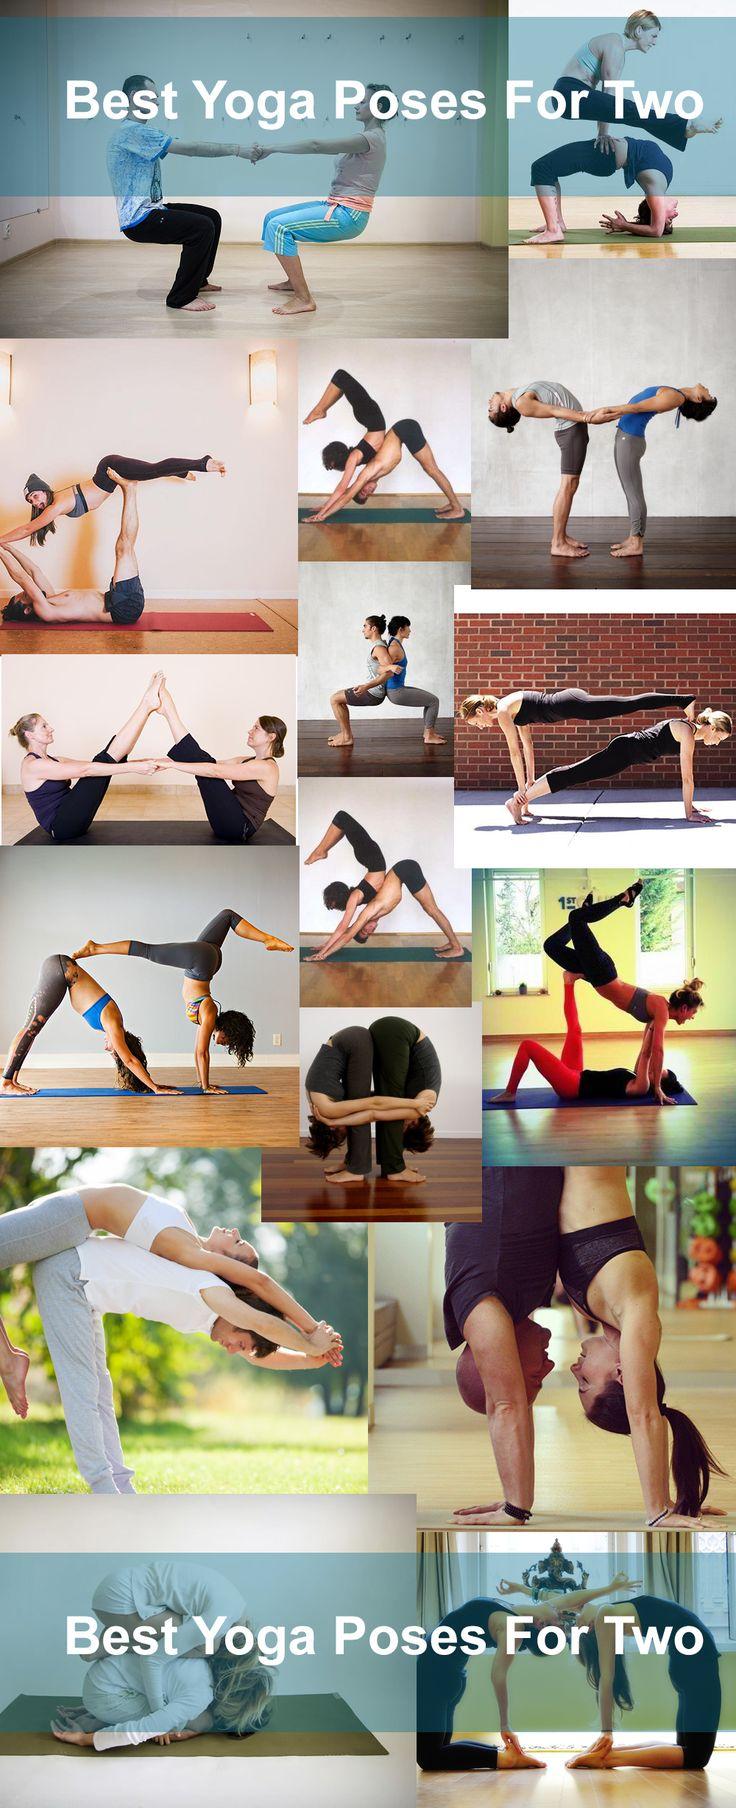 Best Yoga Poses For Two #yoga #fitness #workout #instafit #fitnessaddict #fitnessmodel #fitnessmodels #model #modellife #fashion #shredded #physique #muscles #aesthetics #posing #fitnessmotivation #goals #bodybuilding #Chinesemedicine #Health #Meditation #TCM #Wellness #Yoga # Balance